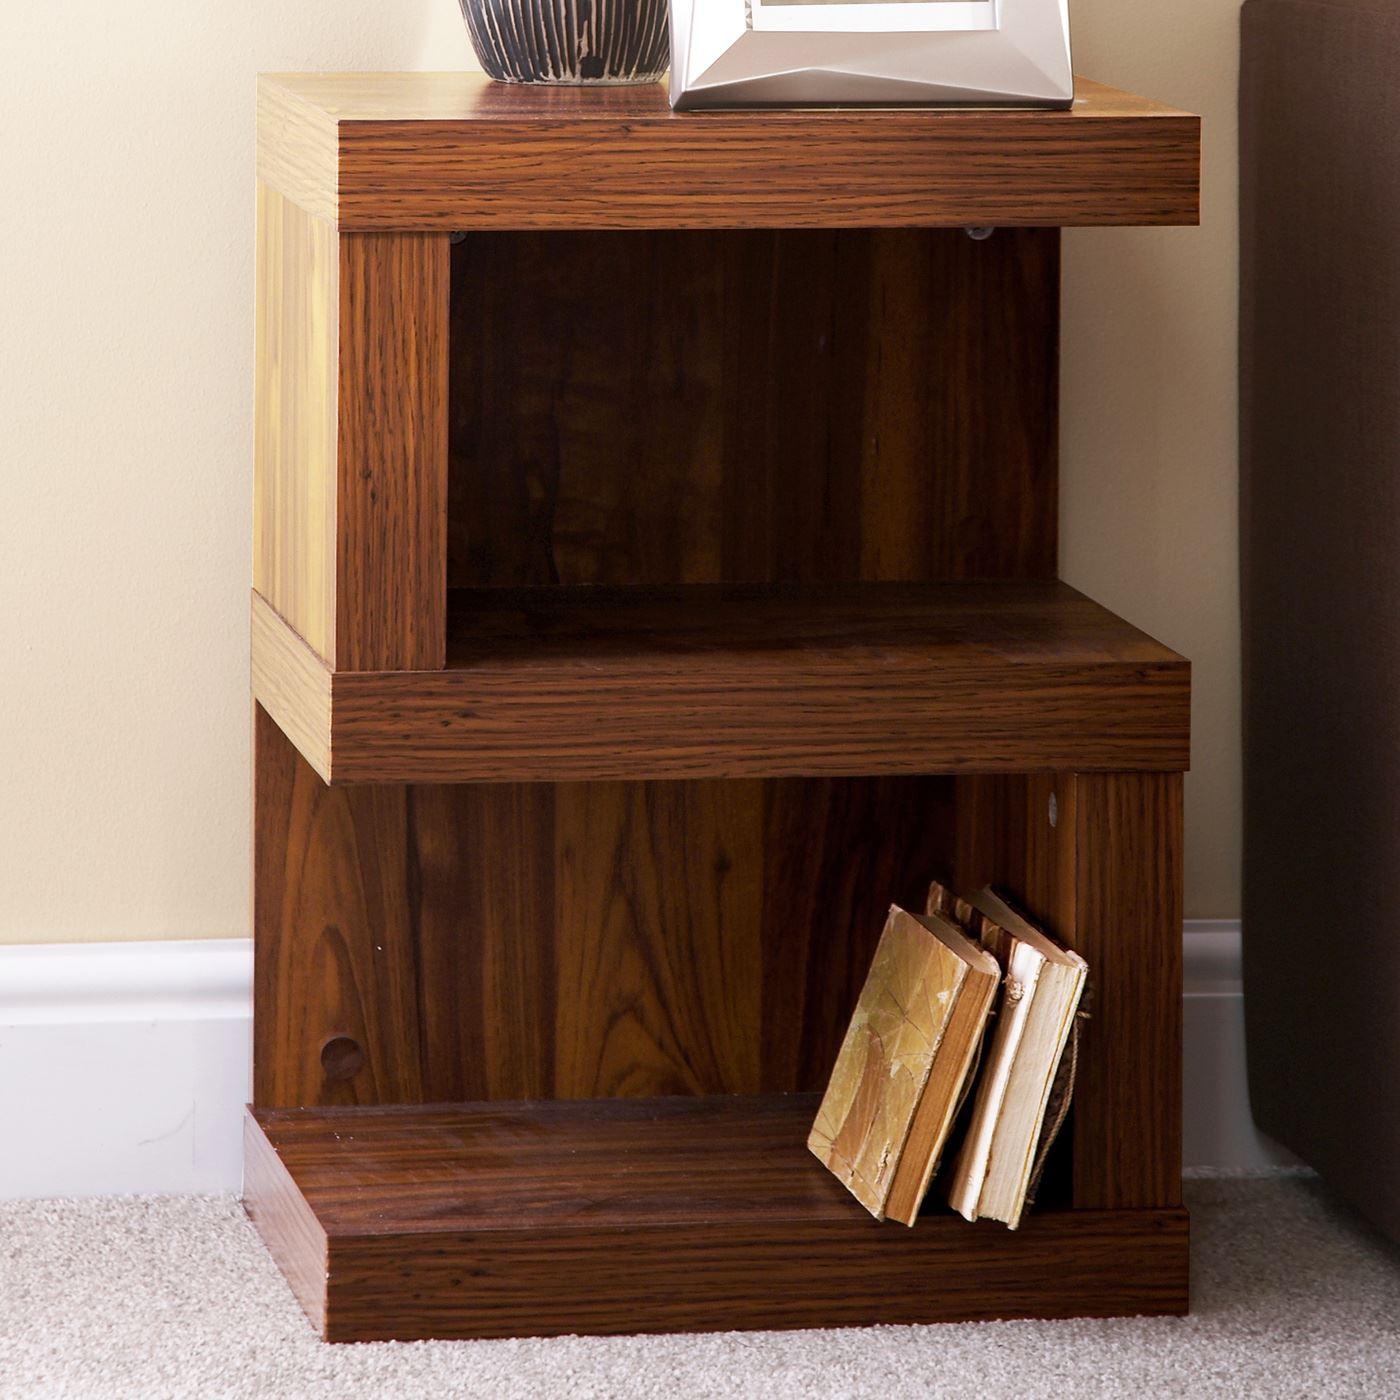 Hampton Living Room Tv Unit Stand Bookshelf Bookside Coffee Lamp.  Hamptonlivingroomtvunitstandbookshelfbookside. Dakota Mango S Shape ...